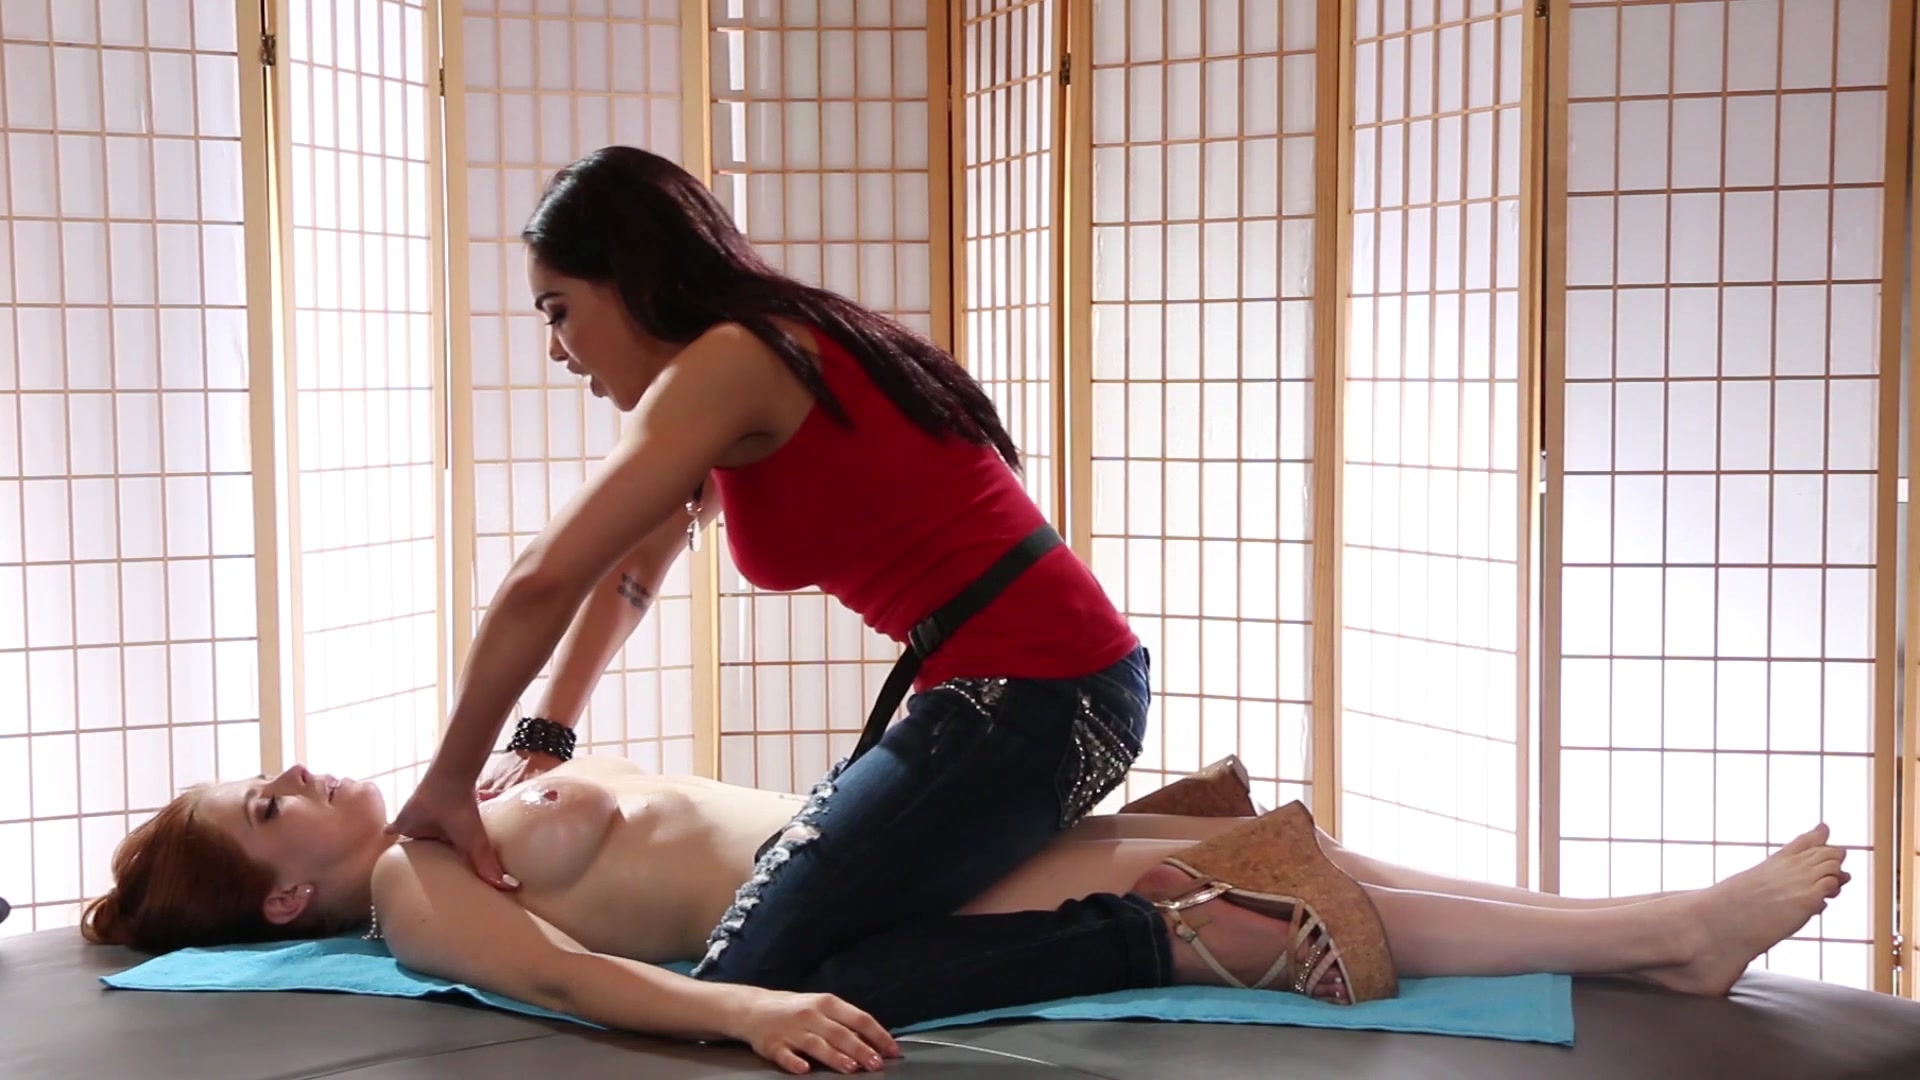 Massage turns into hot orgy